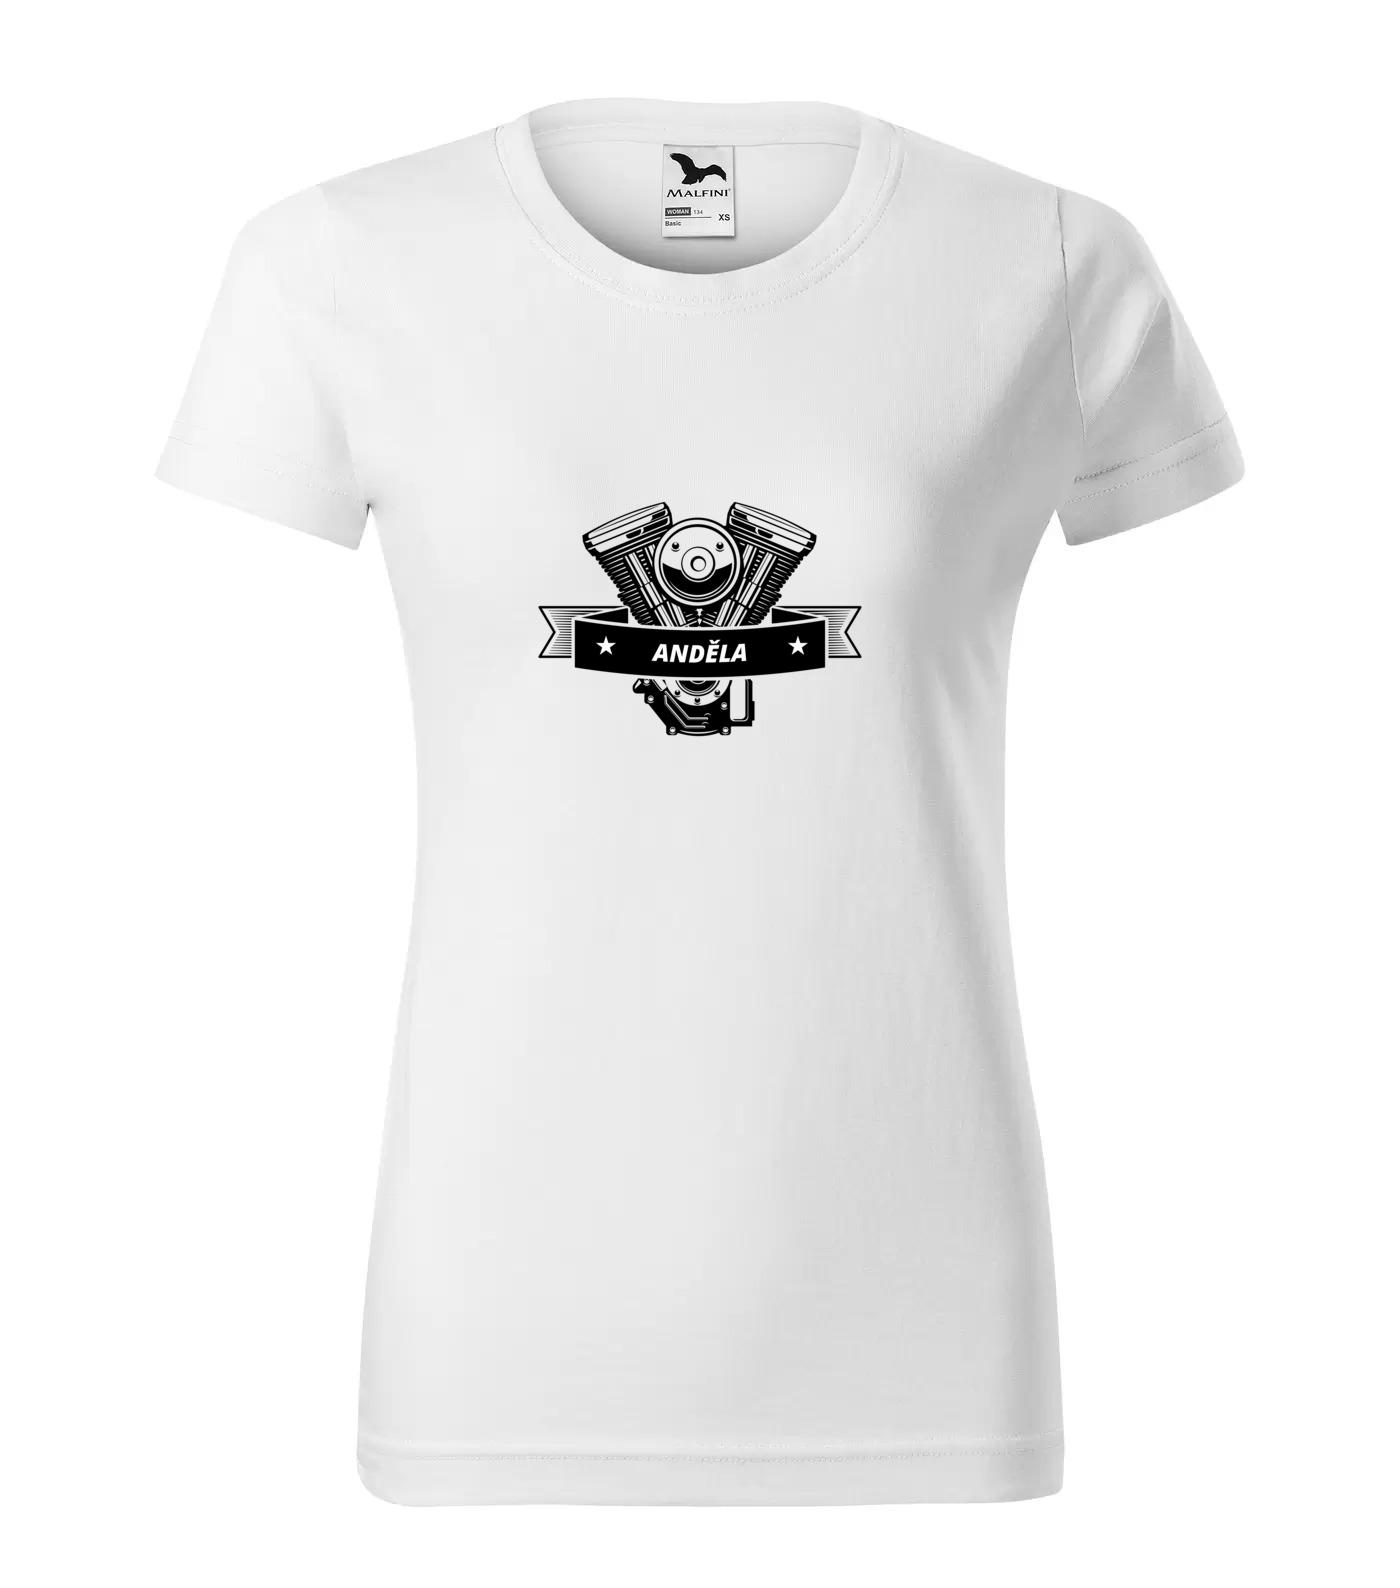 Tričko Motorkářka Anděla